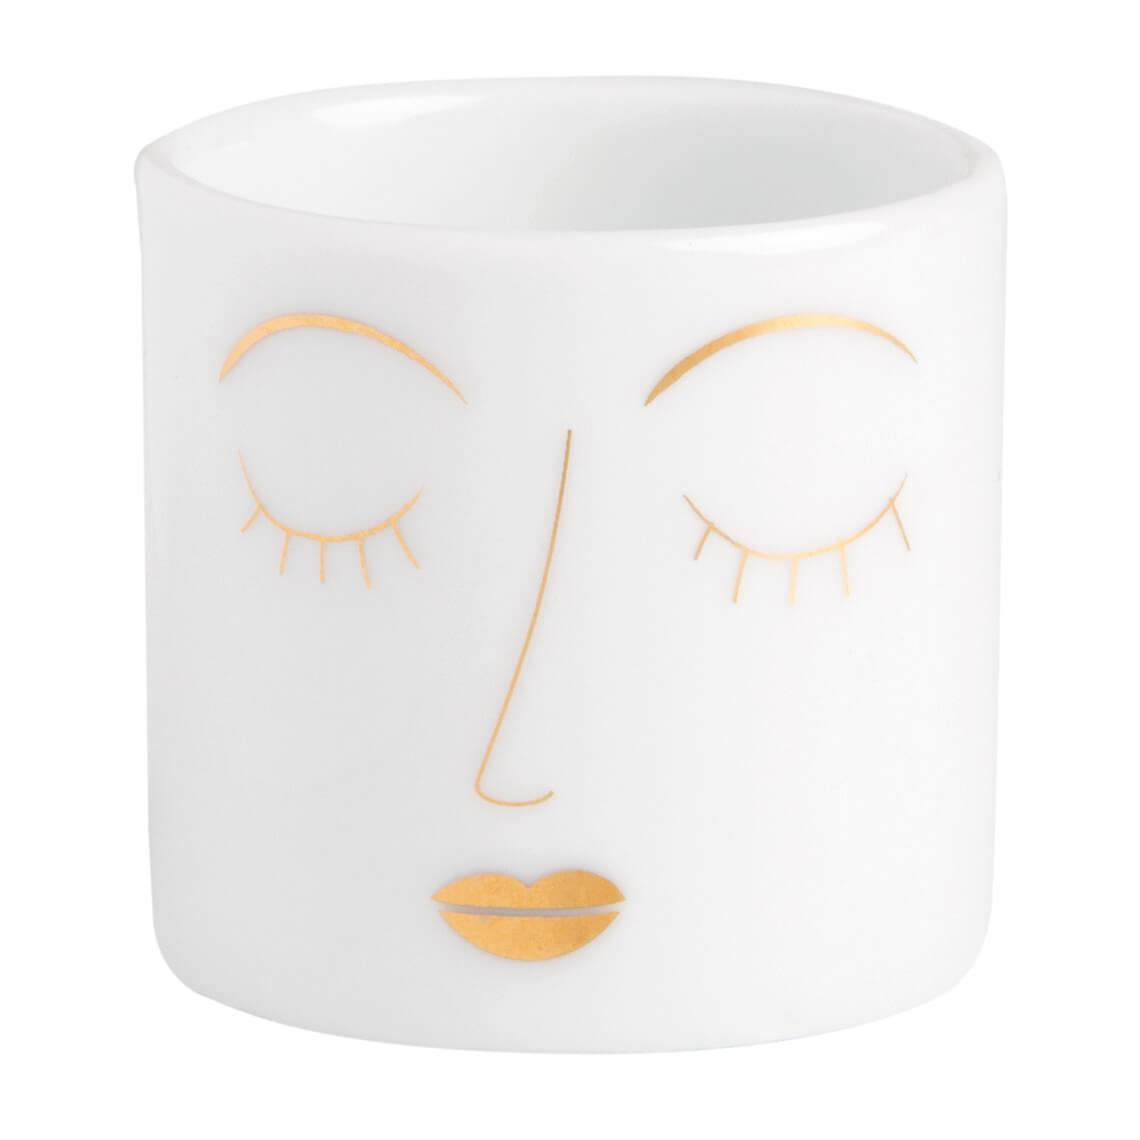 Teelicht - Helle Freude